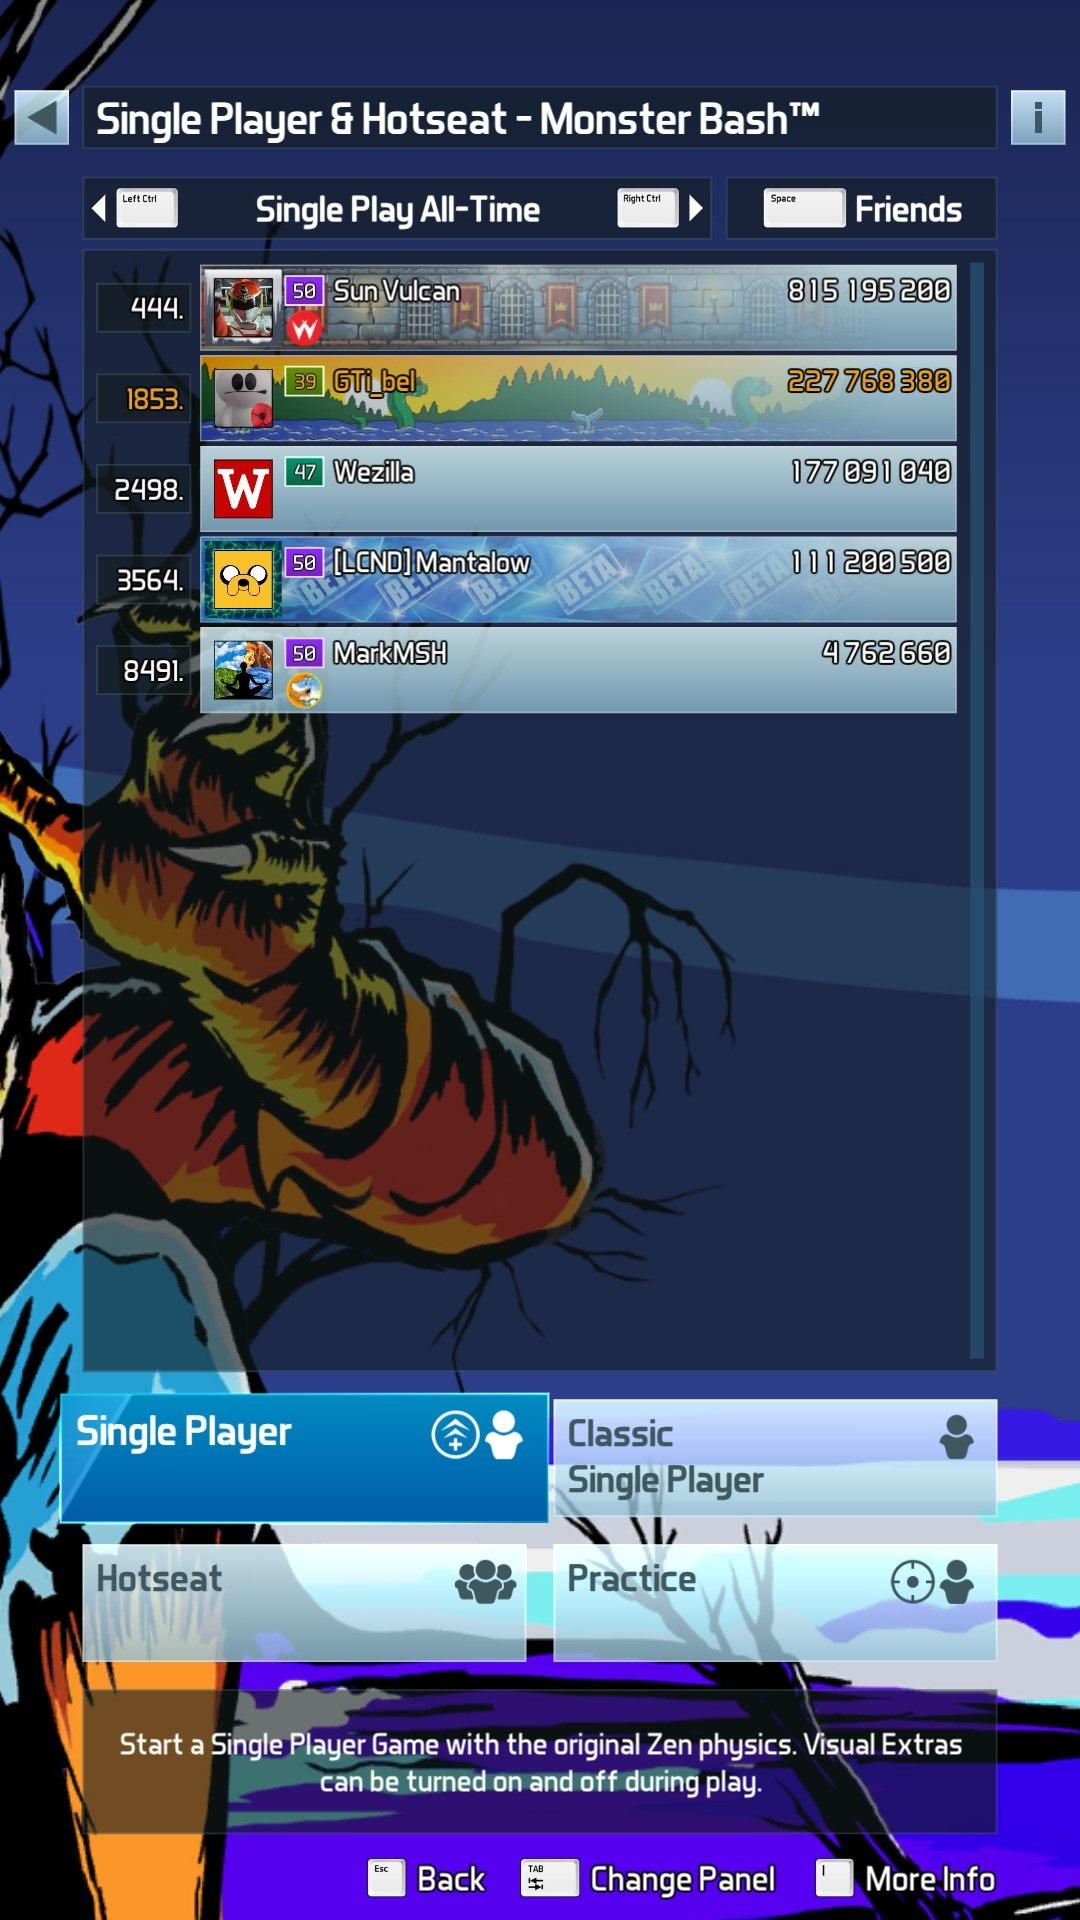 GTibel: Pinball FX3: Monster Bash [Standard] (PC) 227,768,380 points on 2020-01-15 06:17:04